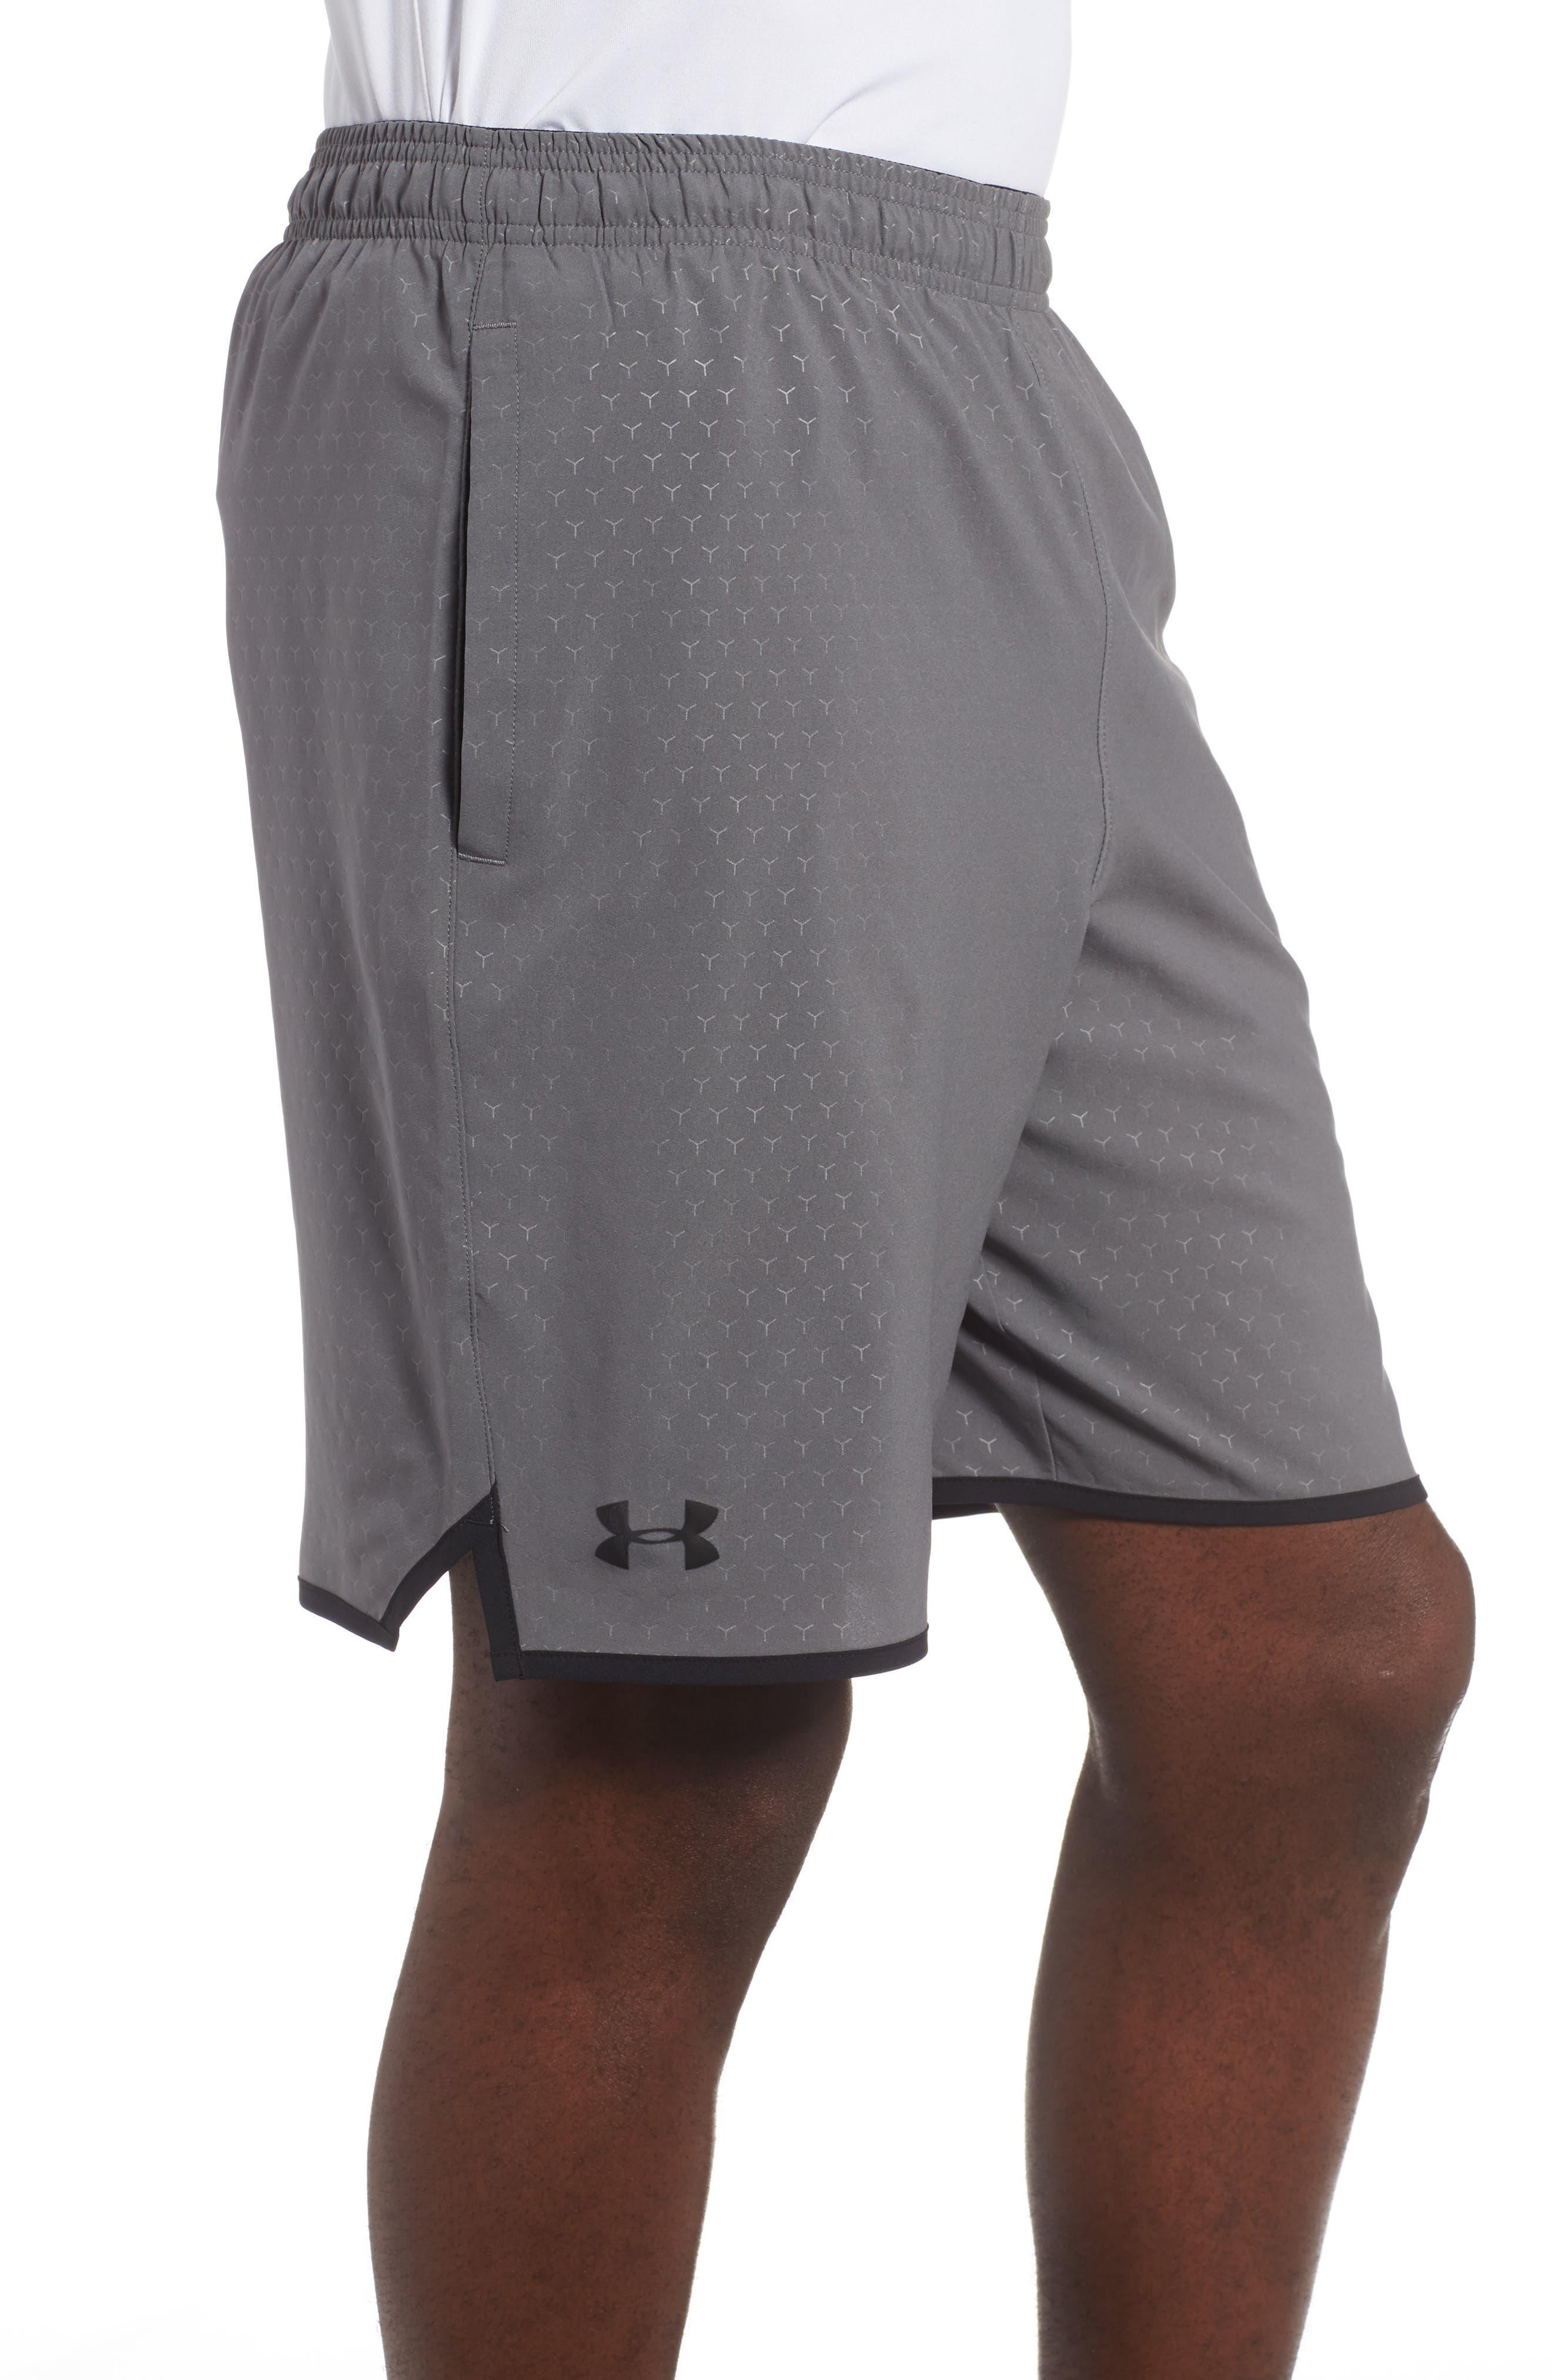 Qualifier Training Shorts,                             Alternate thumbnail 3, color,                             Graphite/ Black